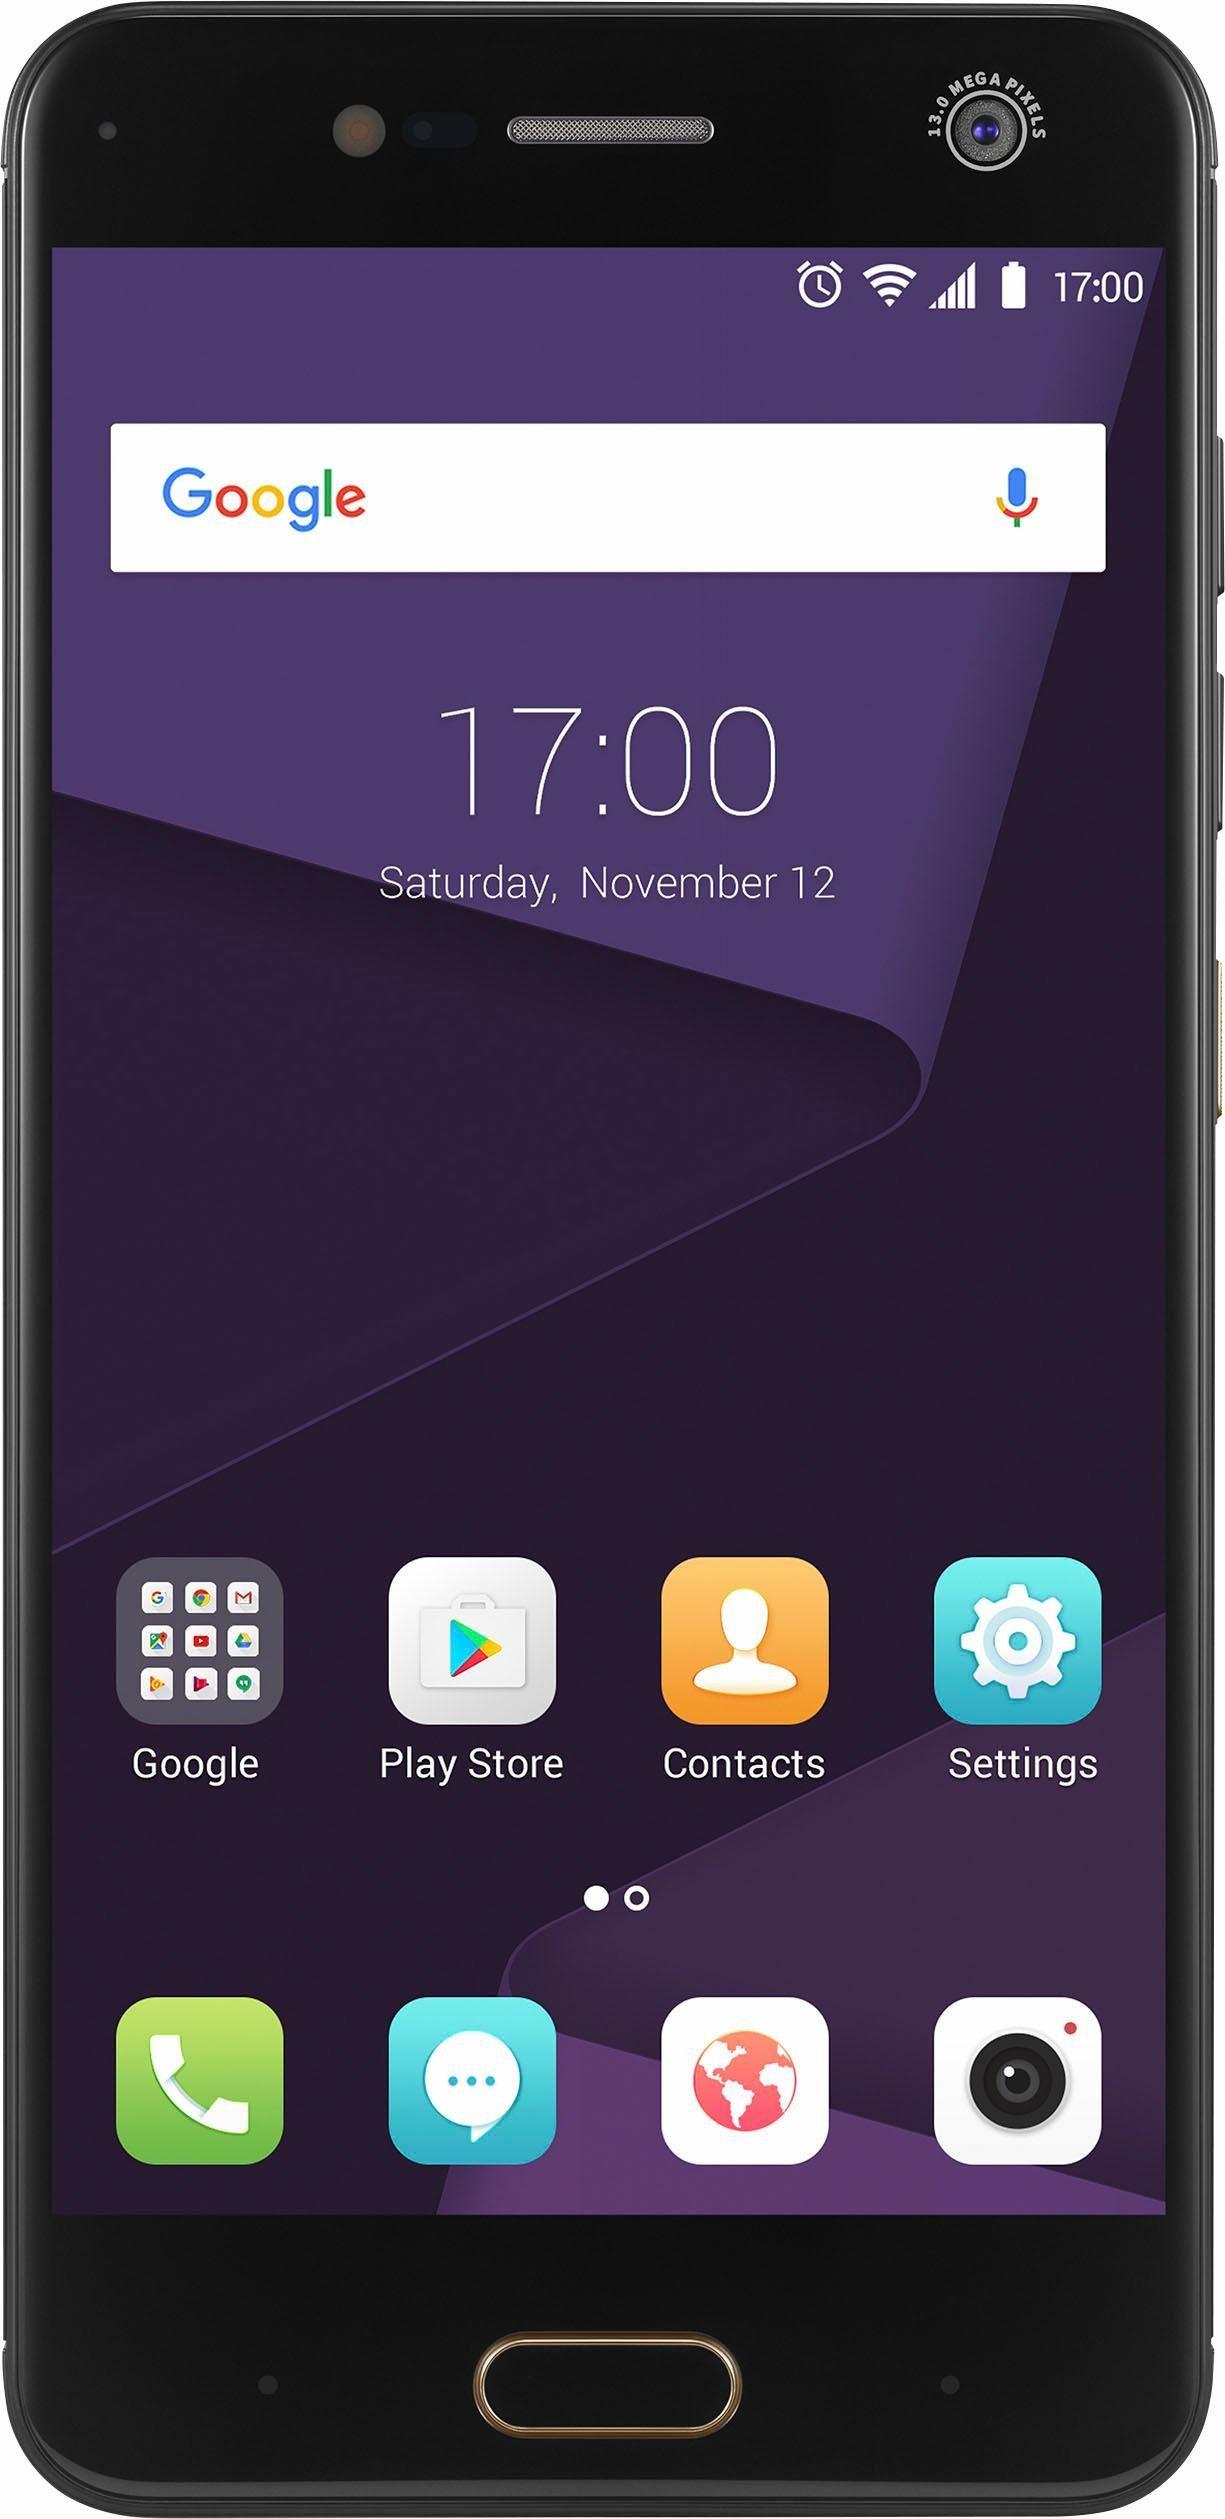 ZTE Blade V8 64GB Smartphone (13,2 cm/5,2 Zoll, 64 GB Speicherplatz, 13 MP Kamera)